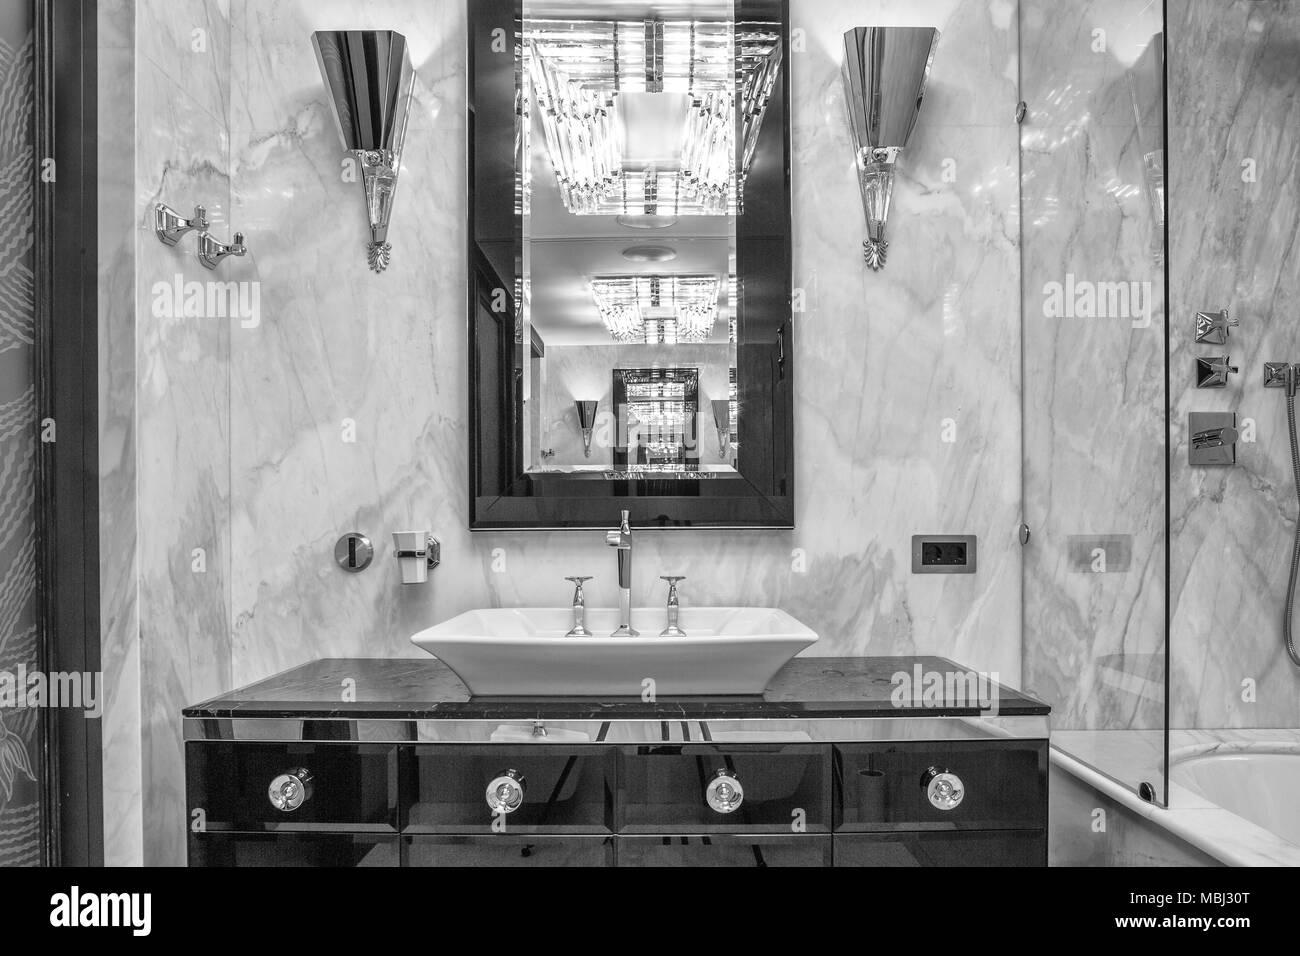 luxury bathroom interior - Stock Image